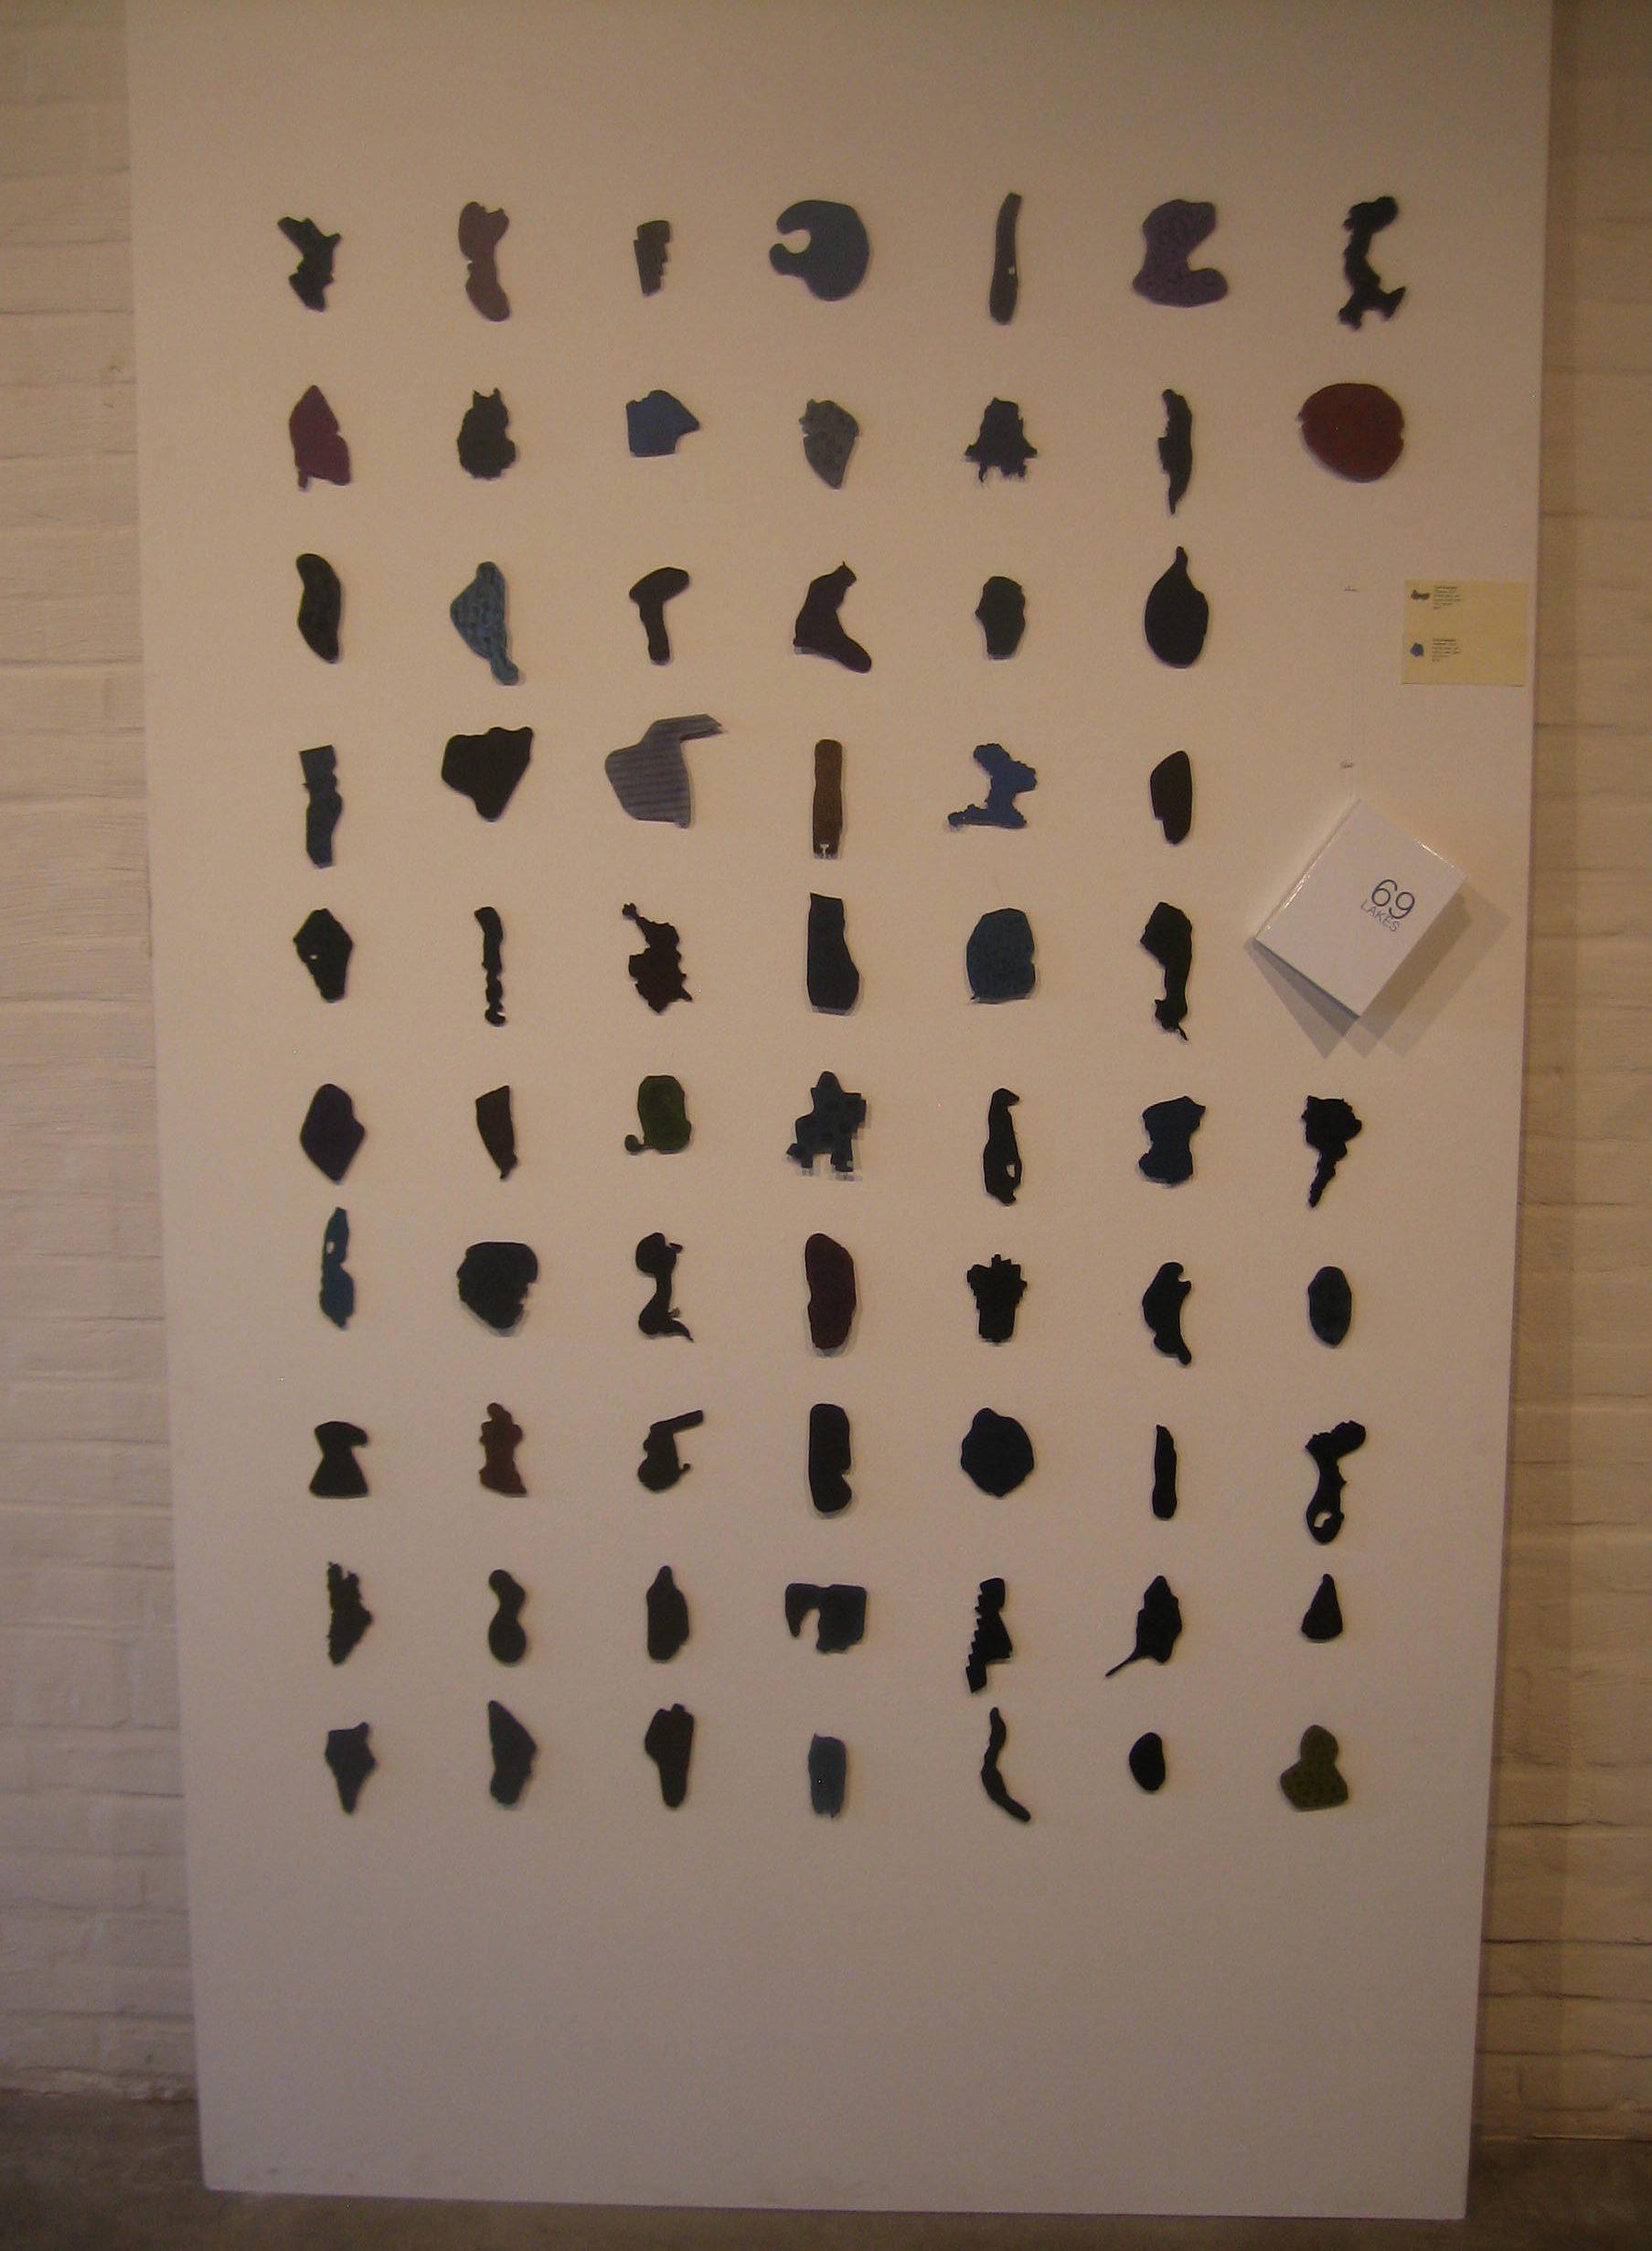 Tore Svensson, 69 Lakes, broches. Galerie Marzee, 2018. Foto Esther Doornbusch, juli 2018©